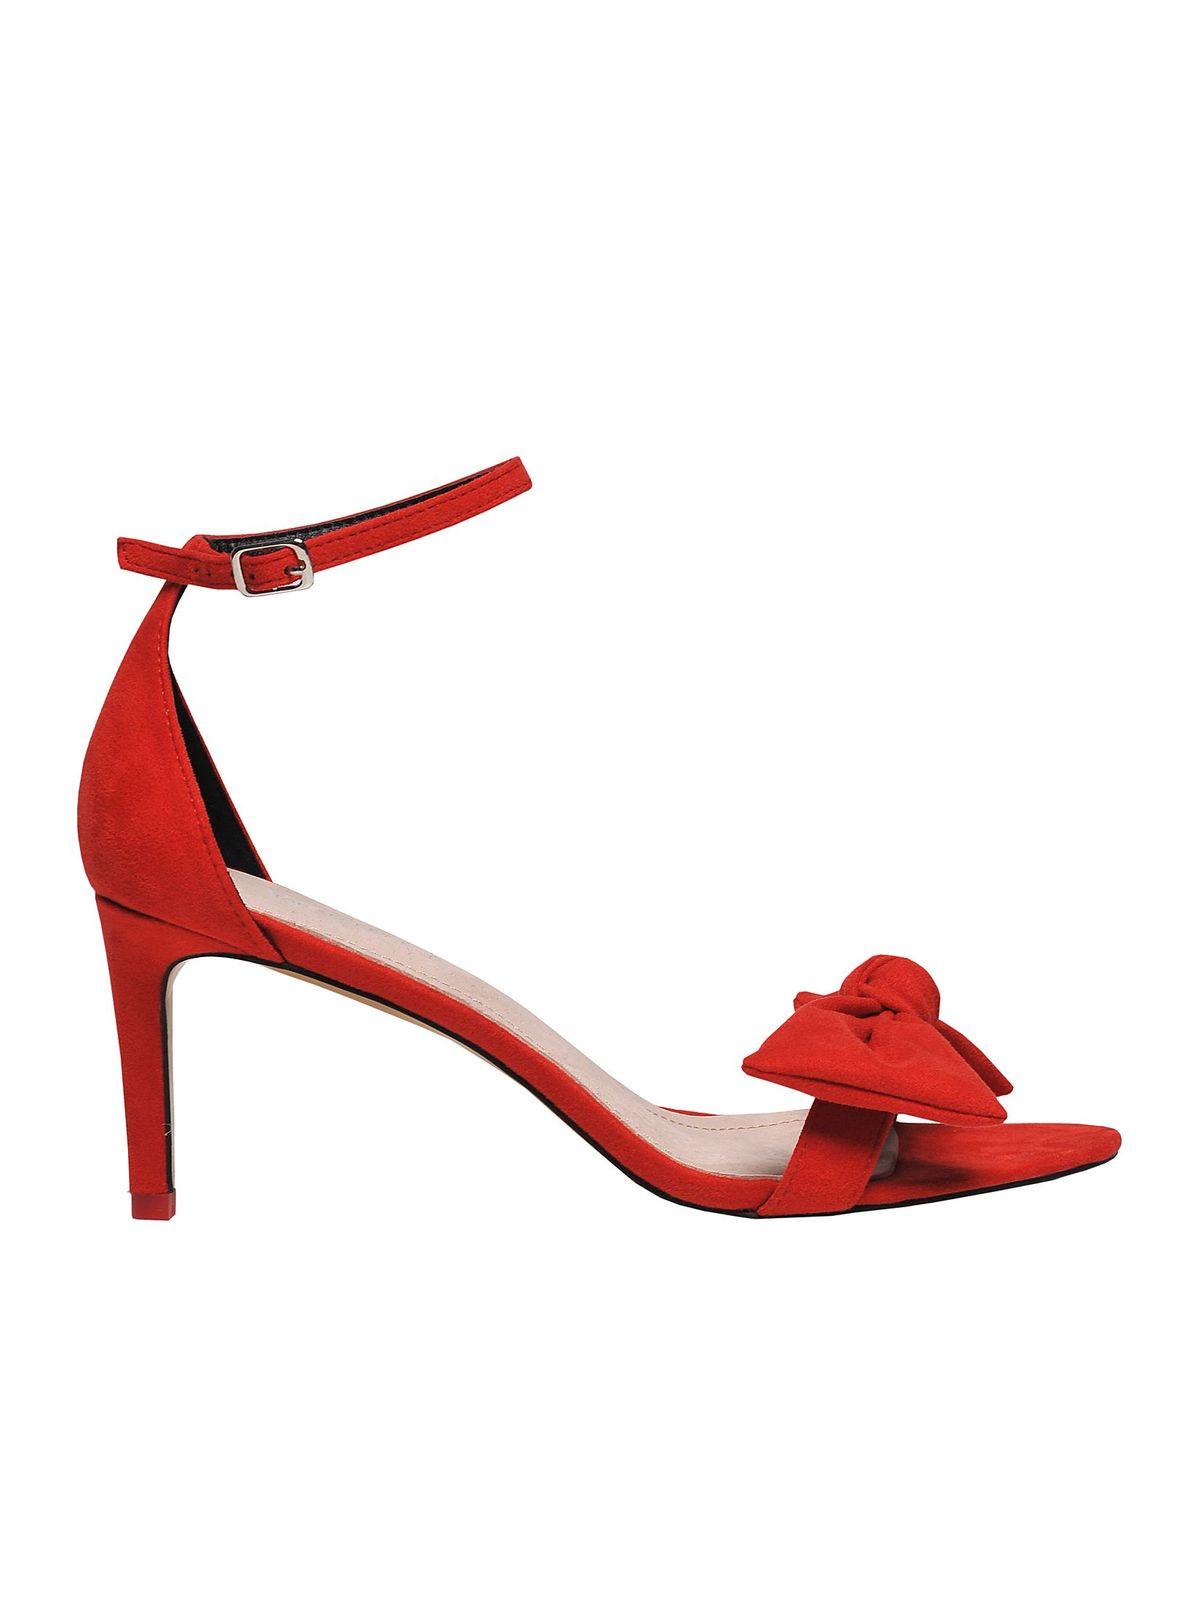 Sandale Top Secret portocalii elegante cu barete subtiri accesorizat cu o fundita